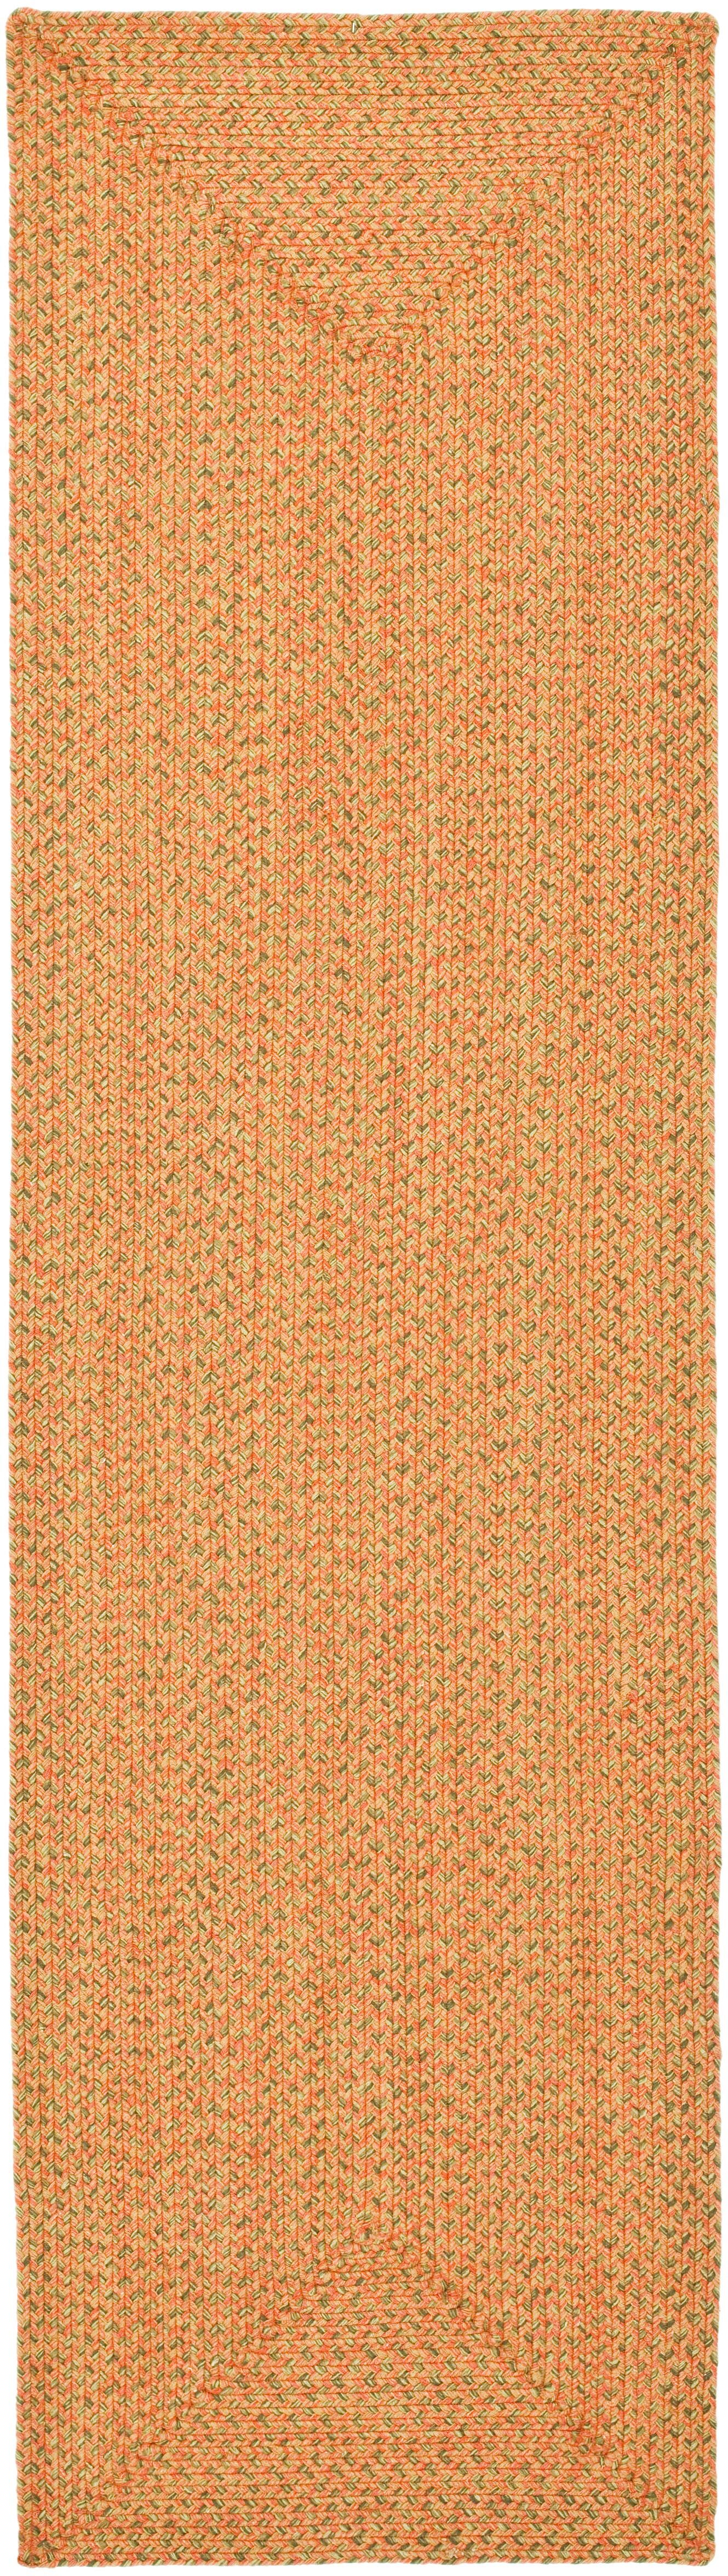 Woodlawn Hand Woven Beige/Orange Area Rug Rug Size: Runner 2'3